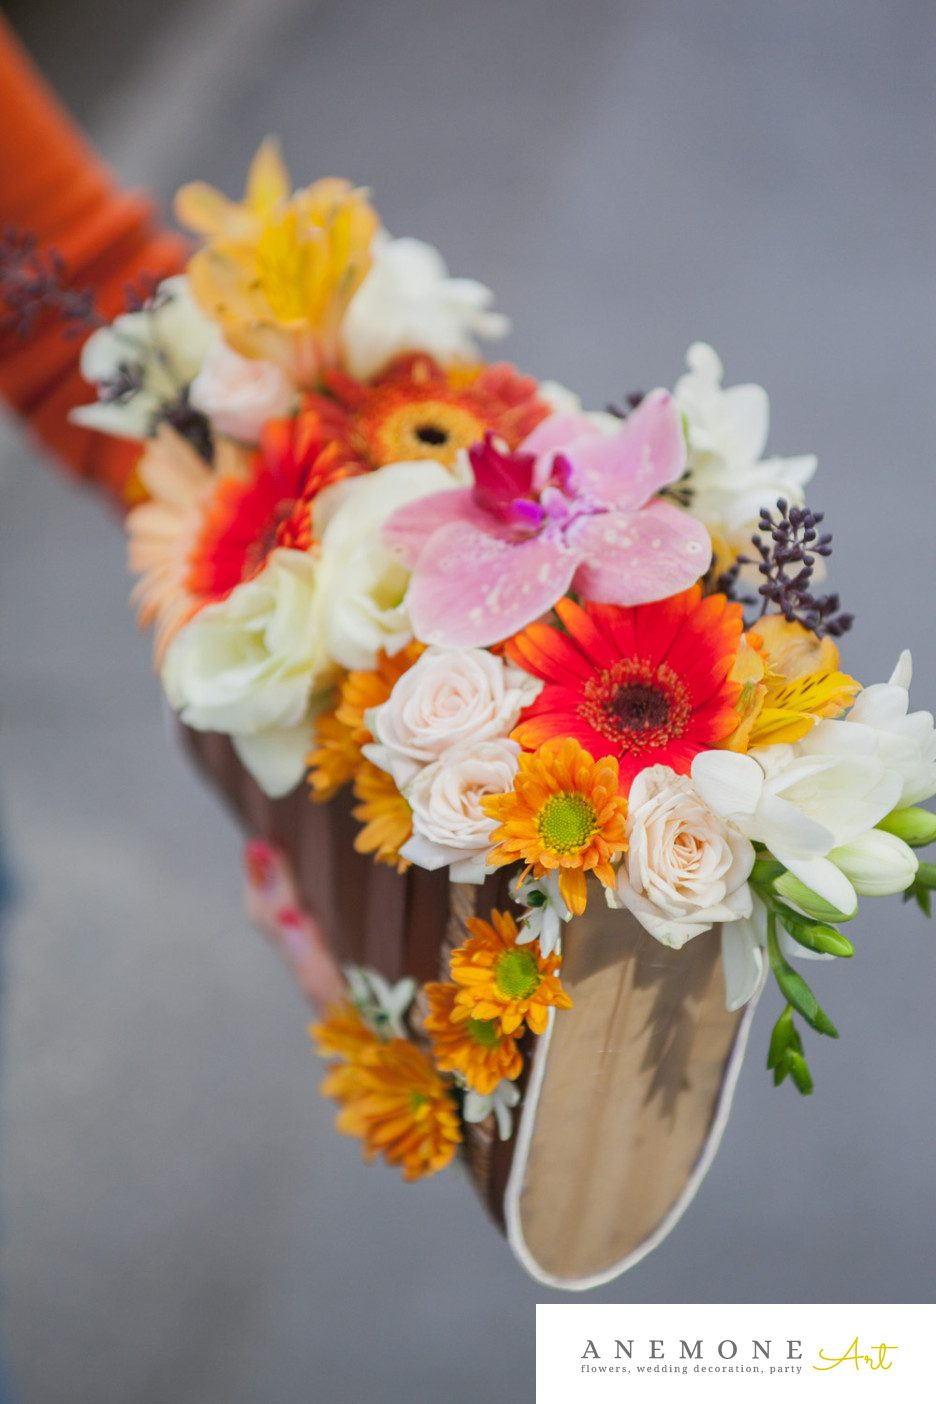 Poza, foto cu Flori de nunta alstroemeria, buchet mireasa, crem, crizanteme, frezii, galben, lisianthus, maro, mini-gerbera, mini-rosa, orhidee, ornitogallum, phalaenopsis, piersica, portocaliu, poseta, toamna in Arad, Timisoara, Oradea (wedding flowers, bouquets) nunta Arad, Timisoara, Oradea